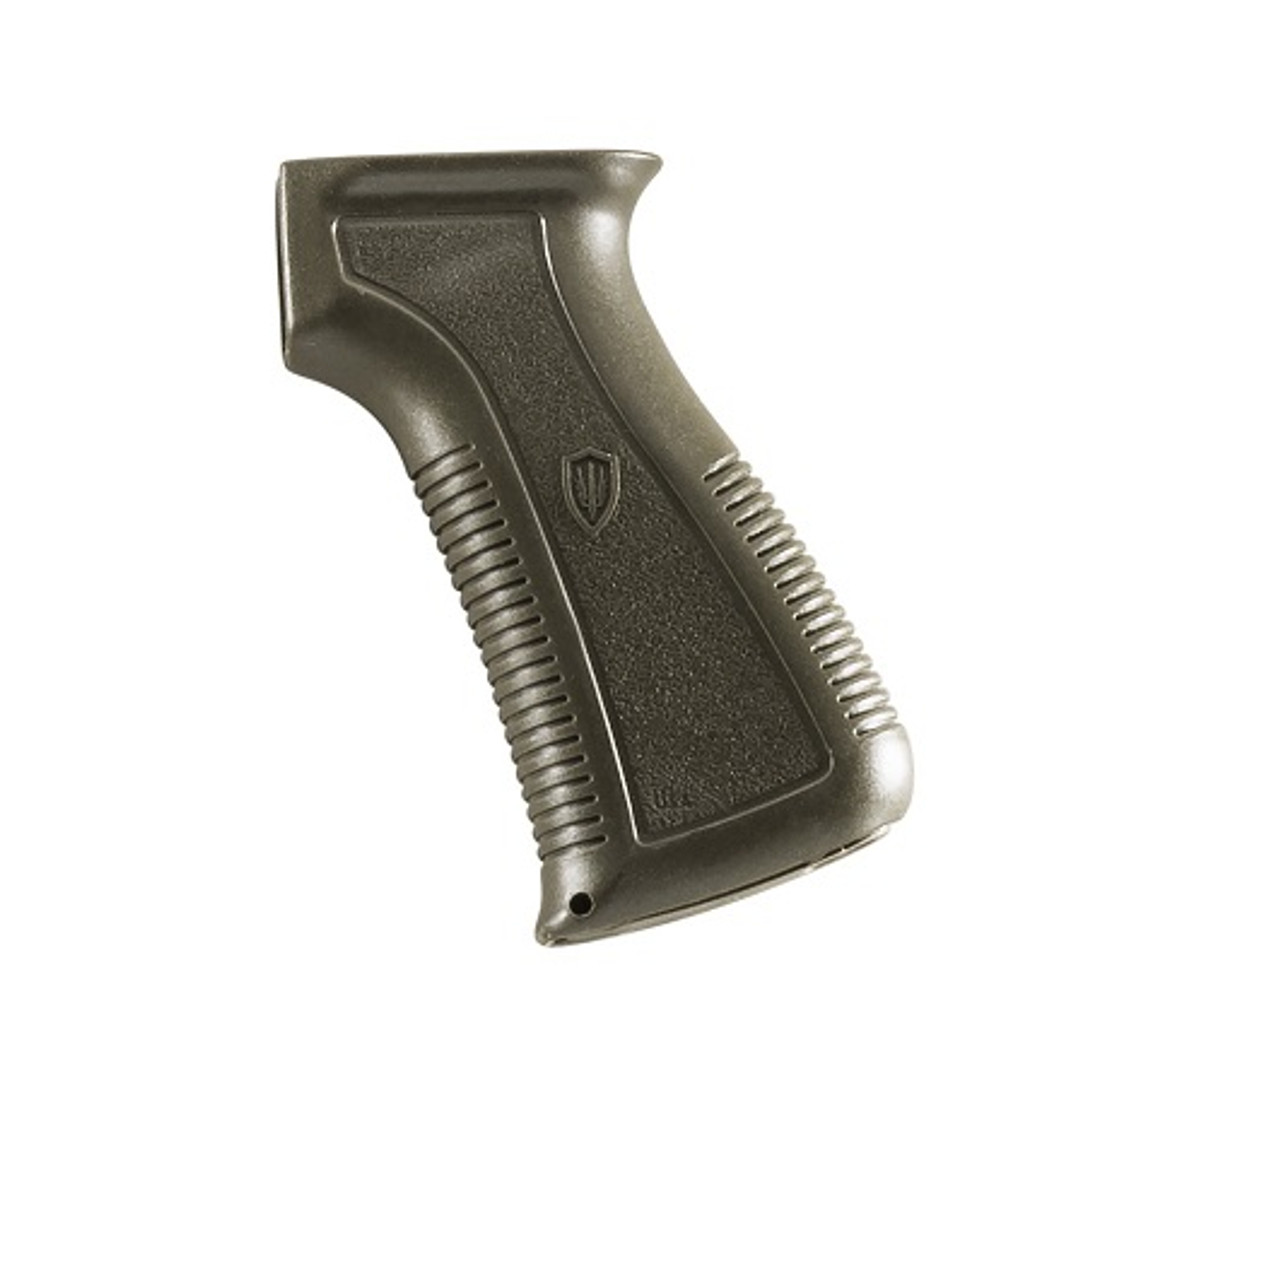 Archangel® OPFOR® AK-Series Pistol Grip - Olive Drab Polymer